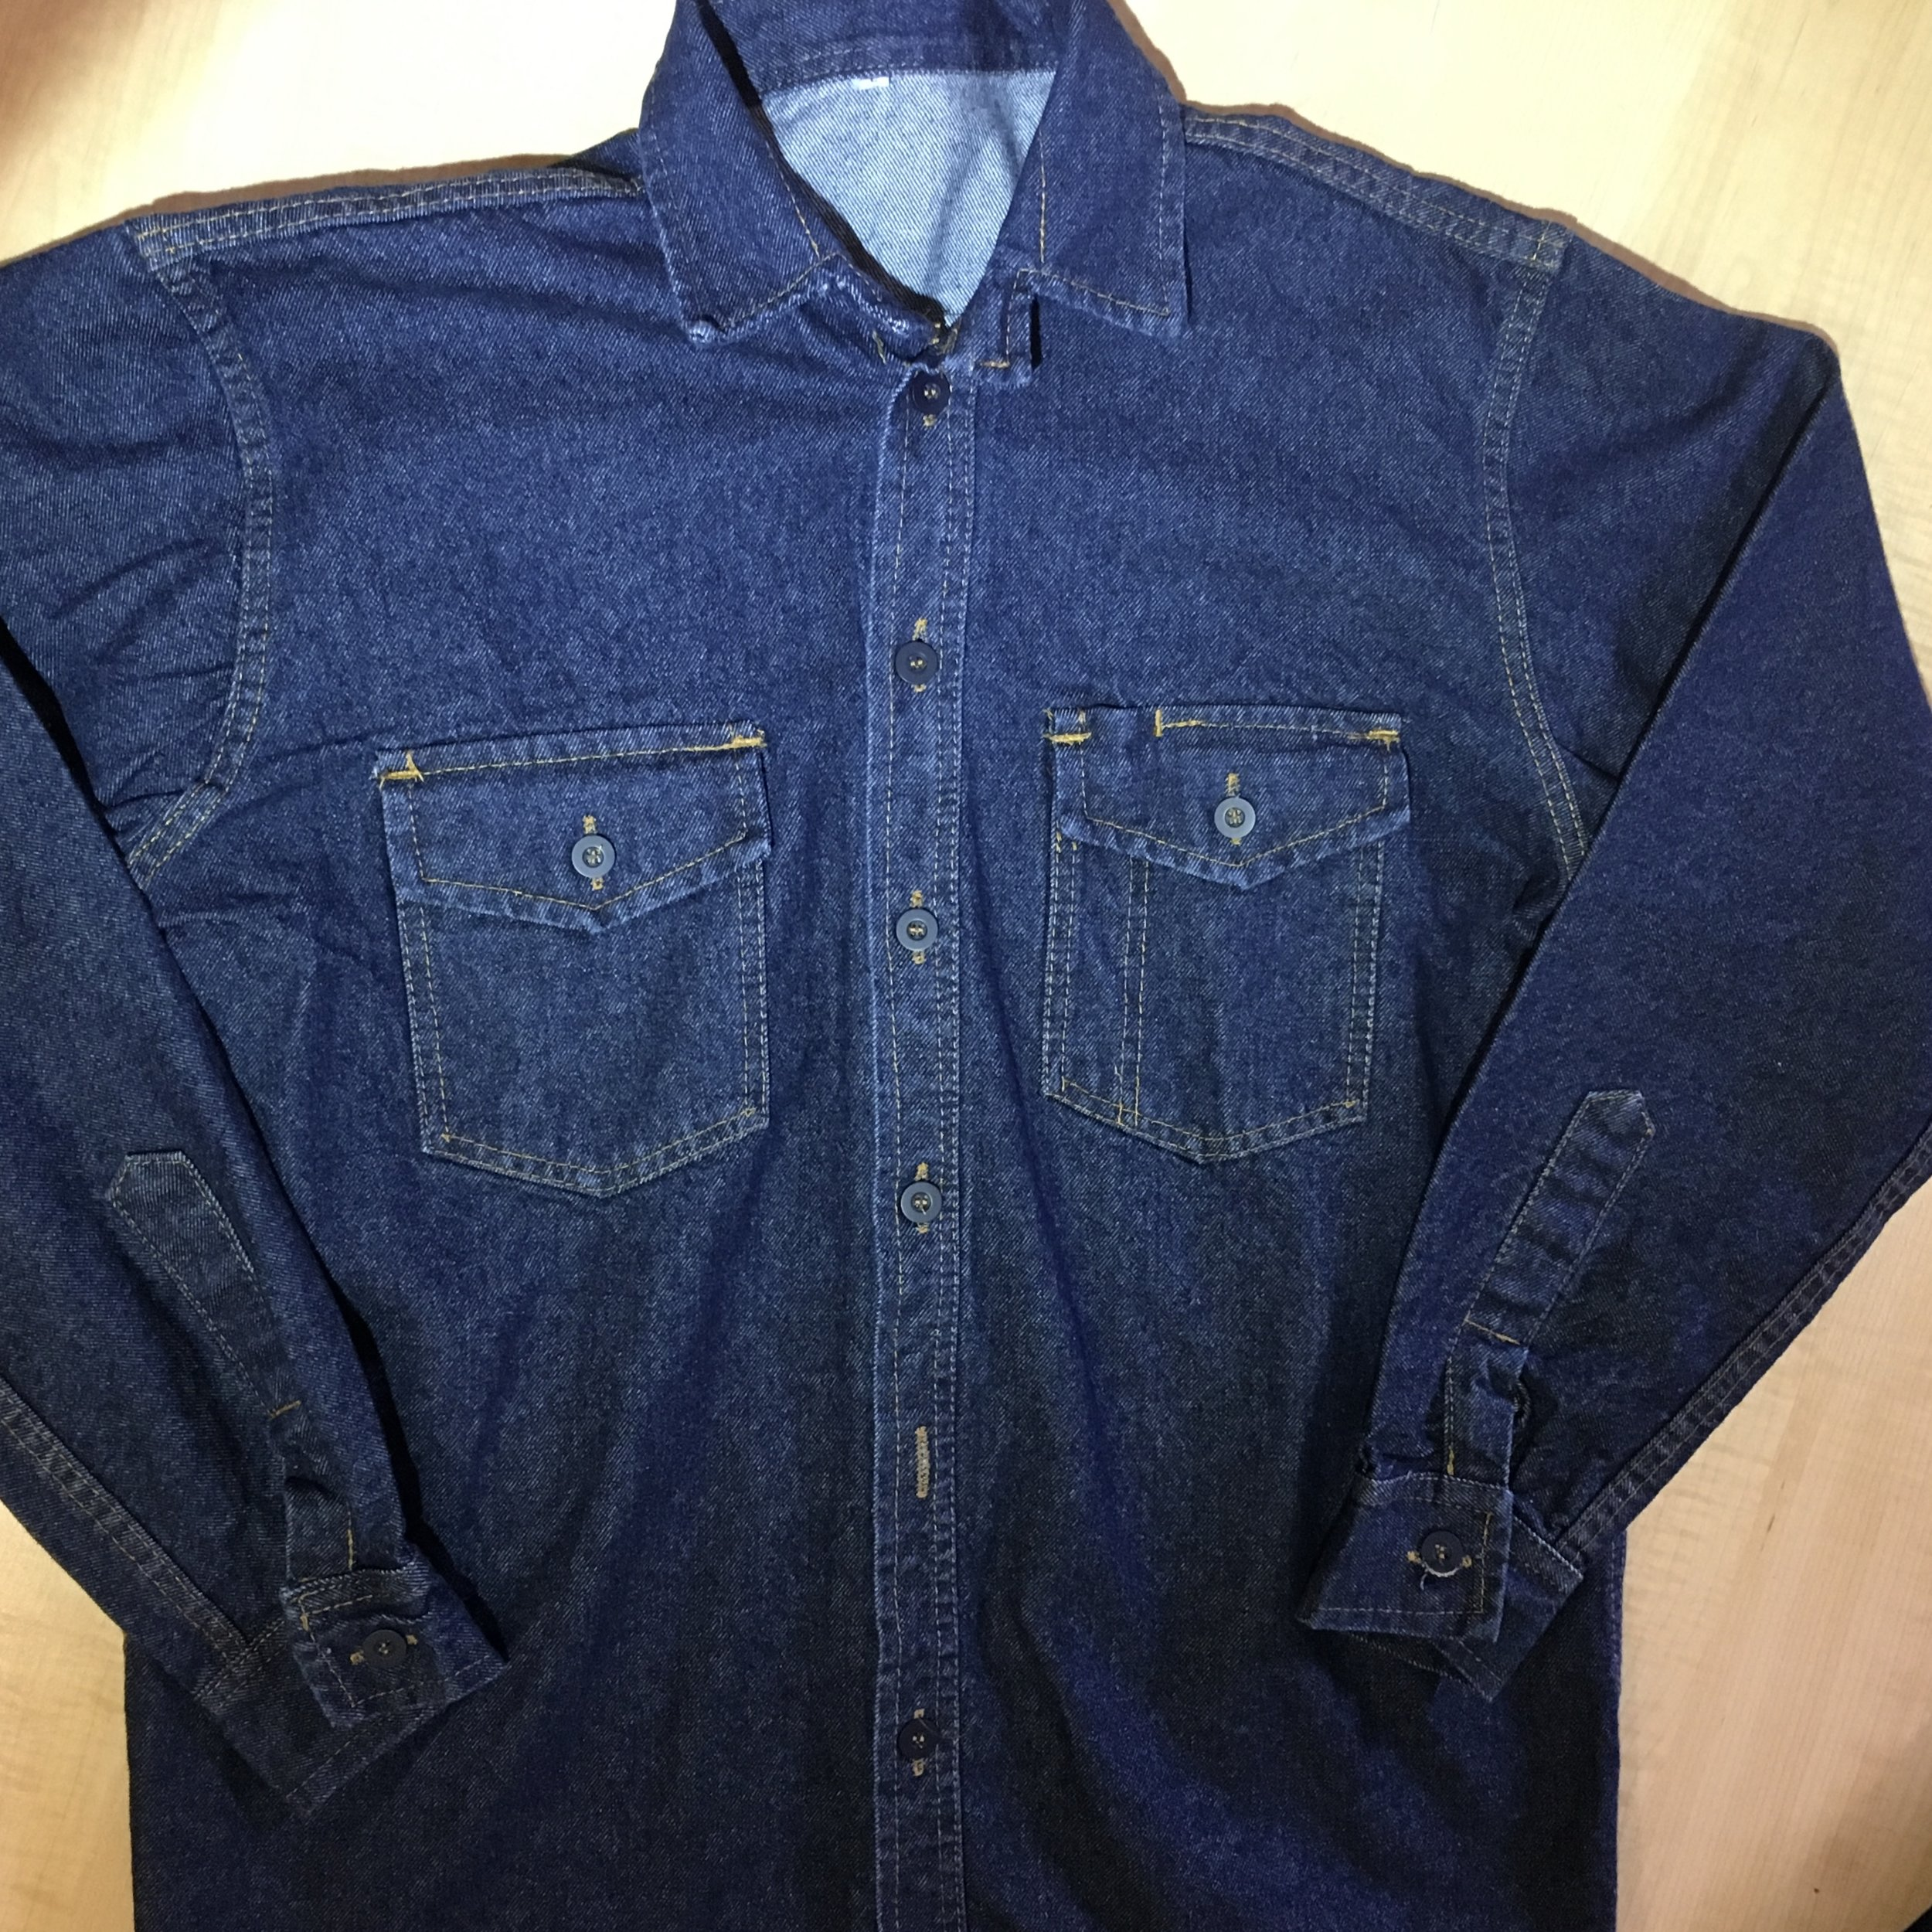 Camisa Jean 14 oz